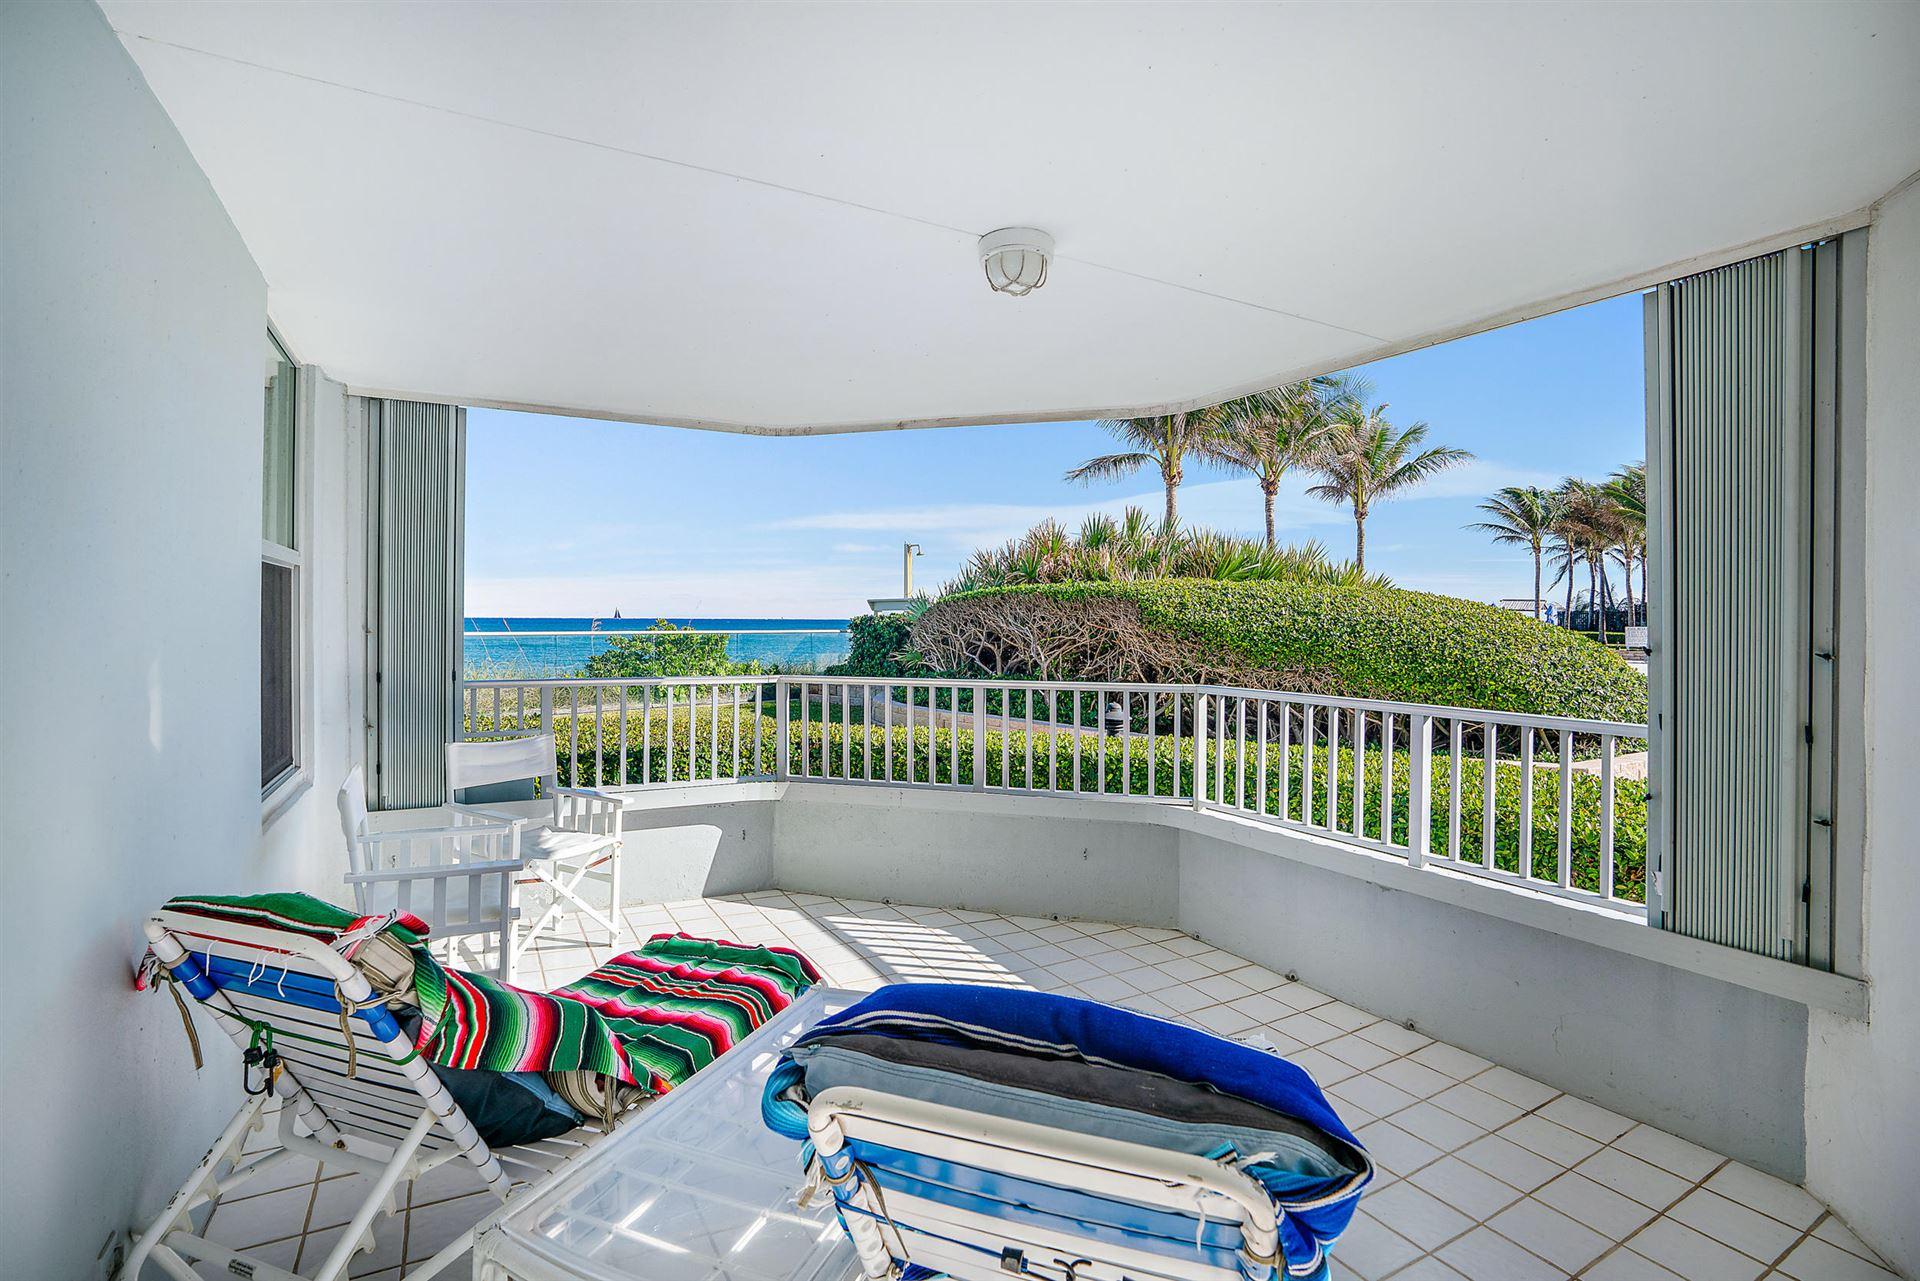 5200 N Ocean Drive #102, Riviera Beach, FL 33404 - MLS#: RX-10701146